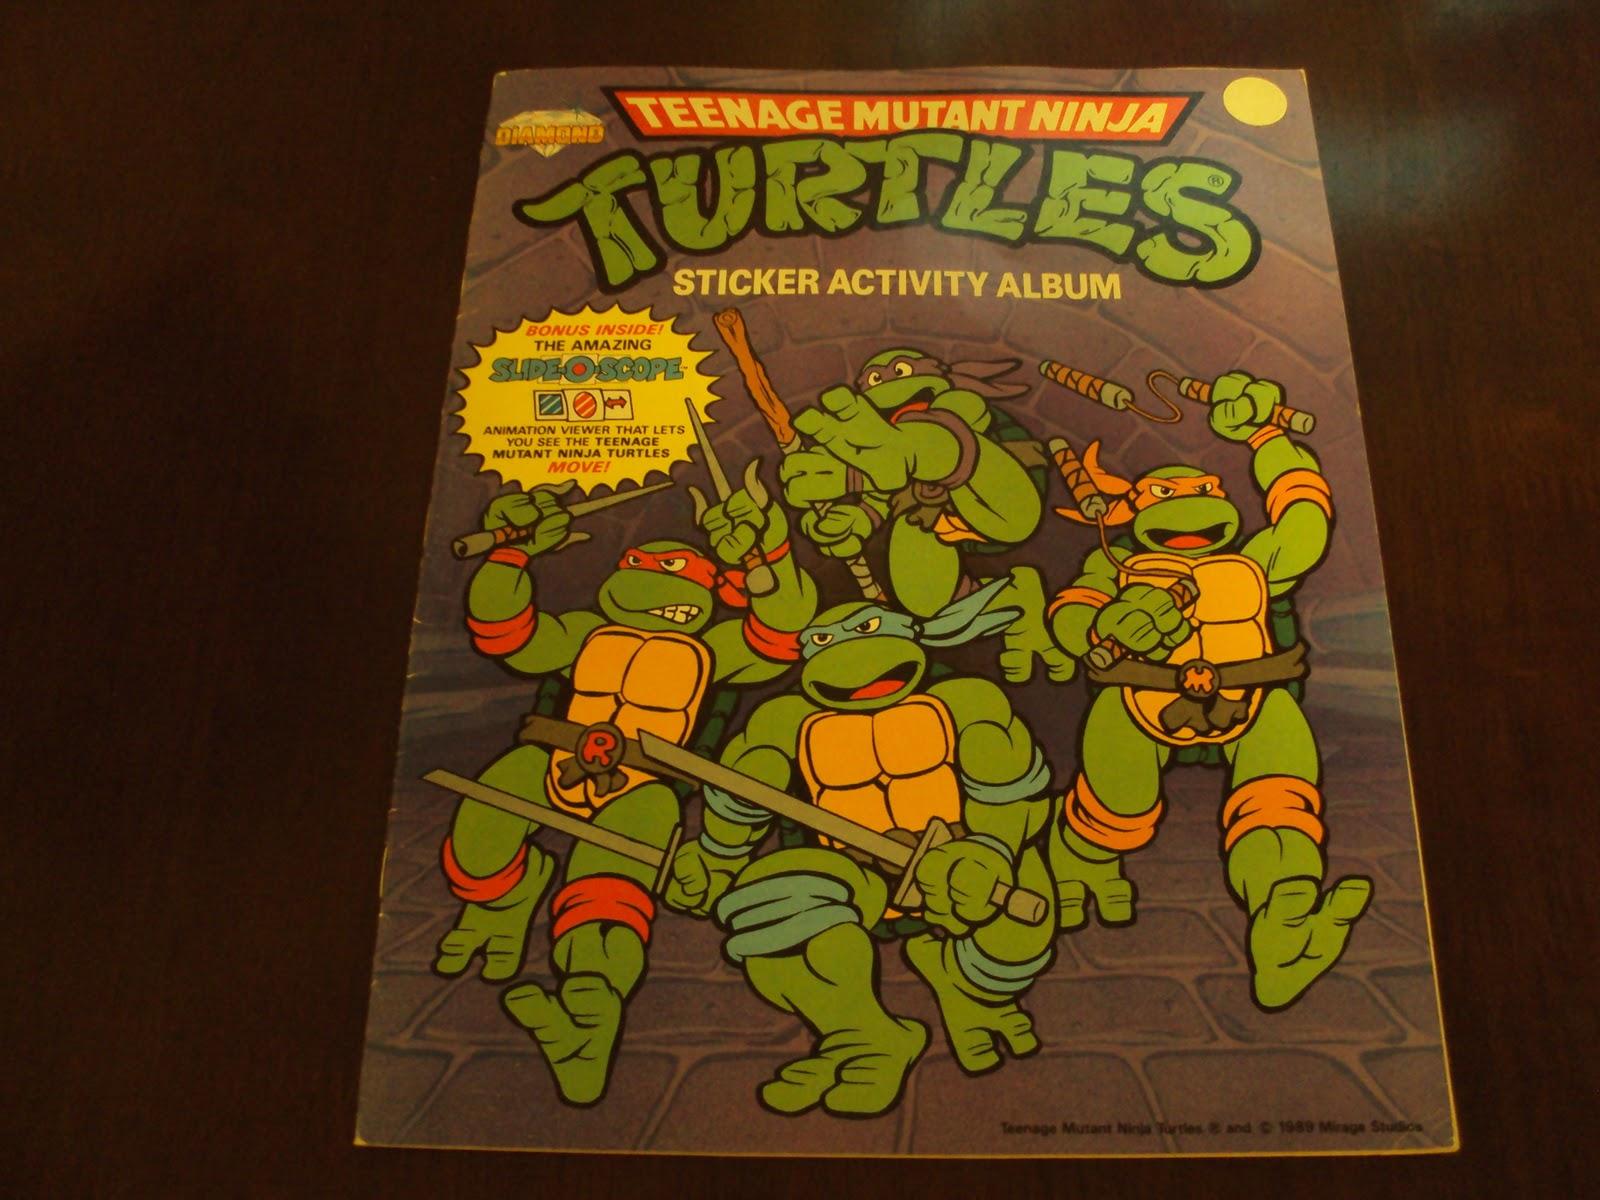 Warm Fresh Coffee I Collect Panini Stickers Diamond Teenage Mutant Ninja Turtles Sticker Activity Album 1989 100 Complete